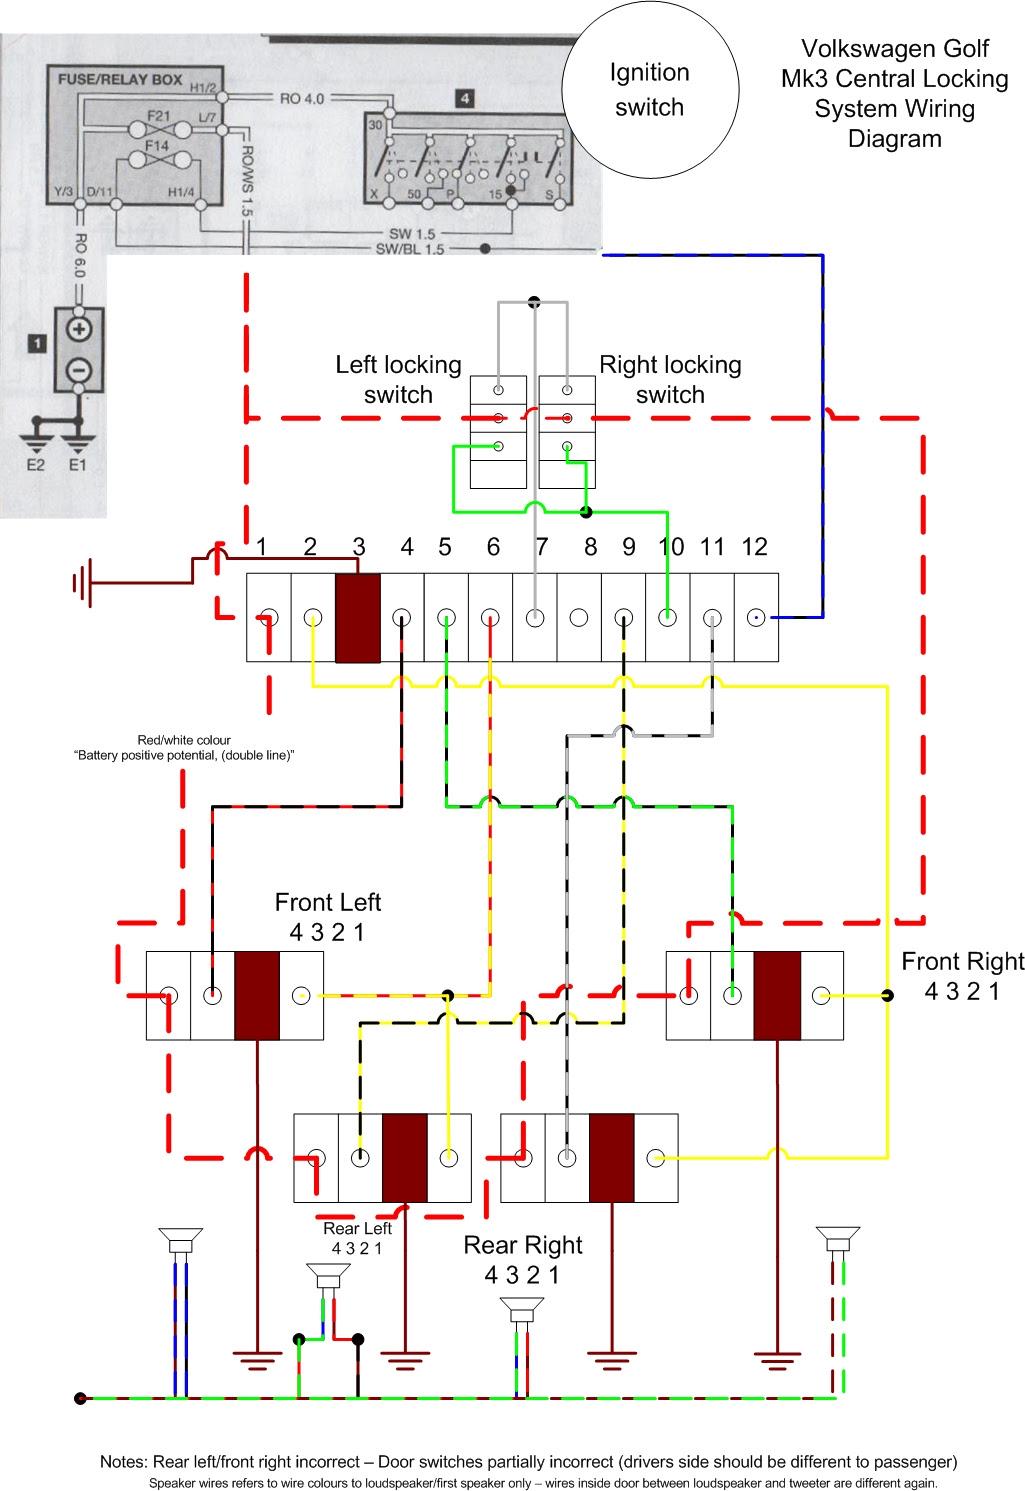 Diagram Vw Golf 3 Electrical Wiring Diagram Full Version Hd Quality Wiring Diagram Diagramdaysc Nowroma It